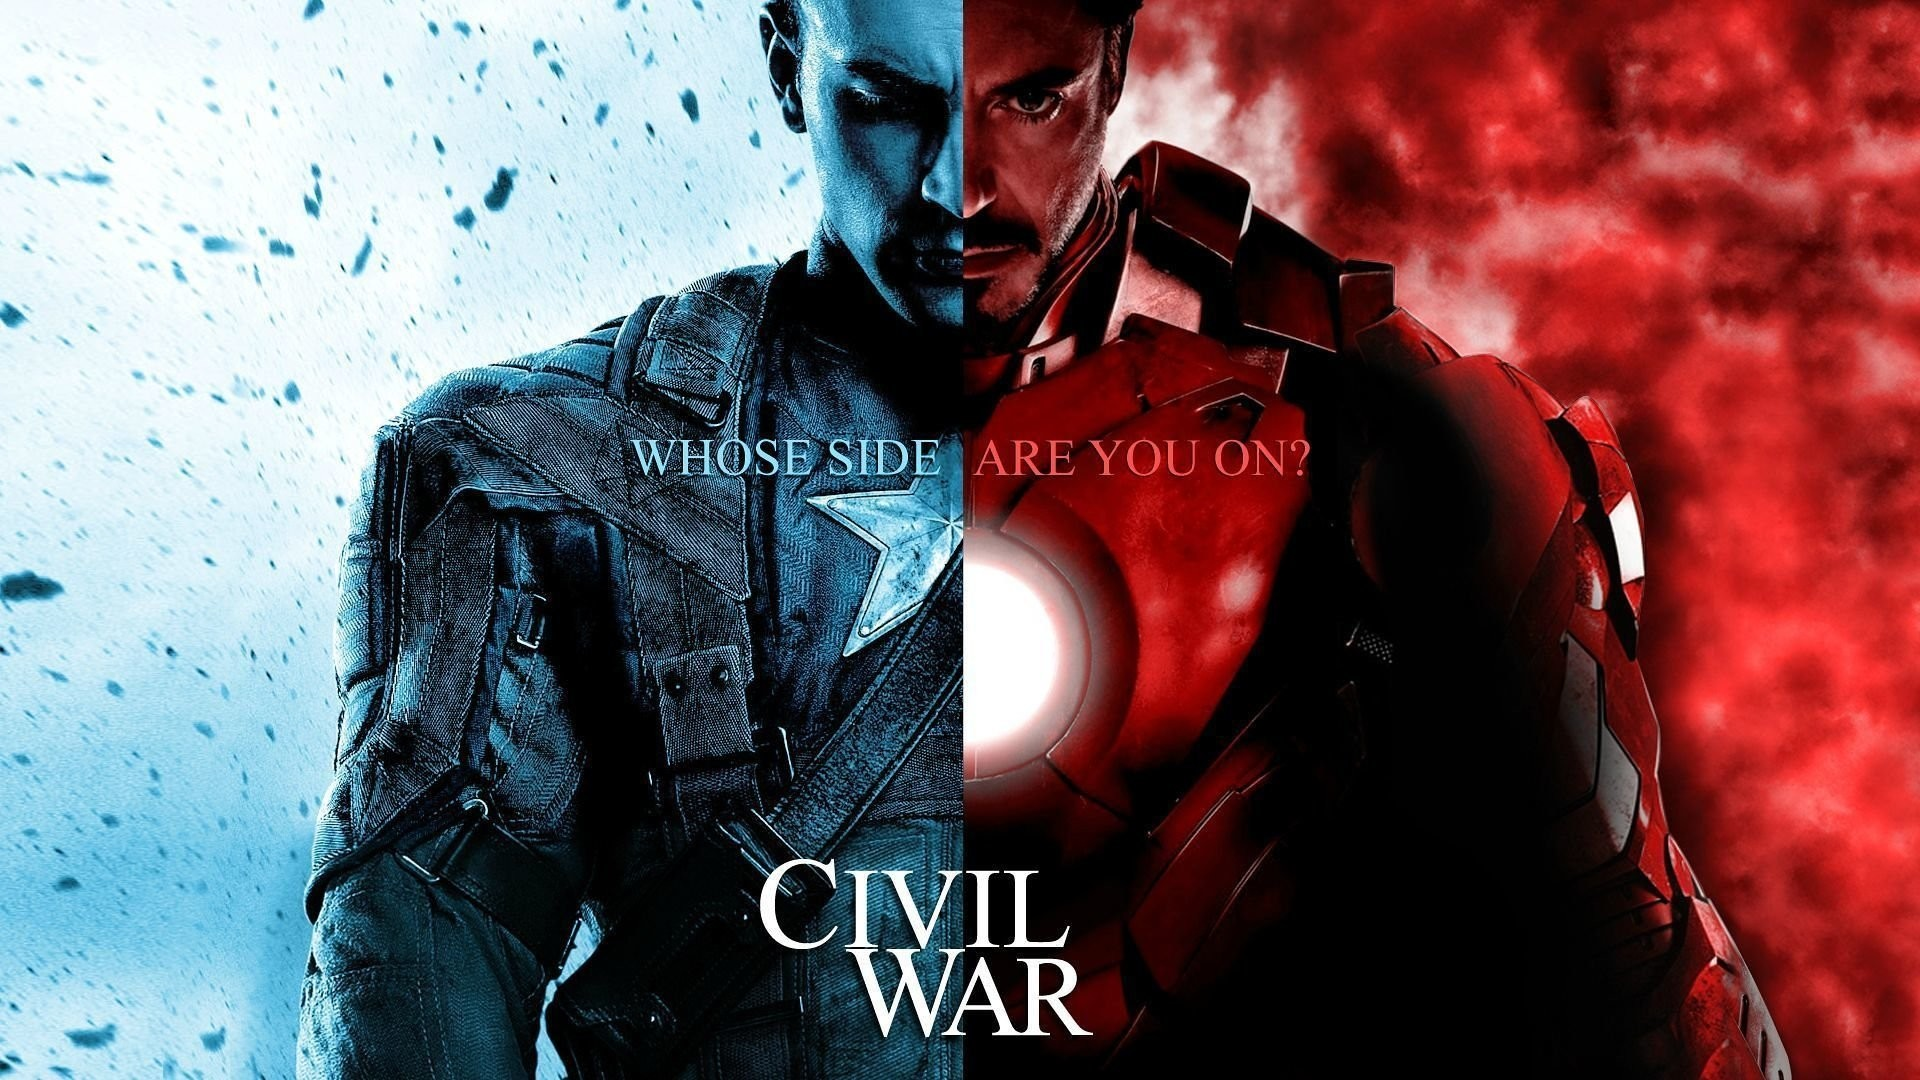 Captain America Civil War HD Wallpapers Backgrounds